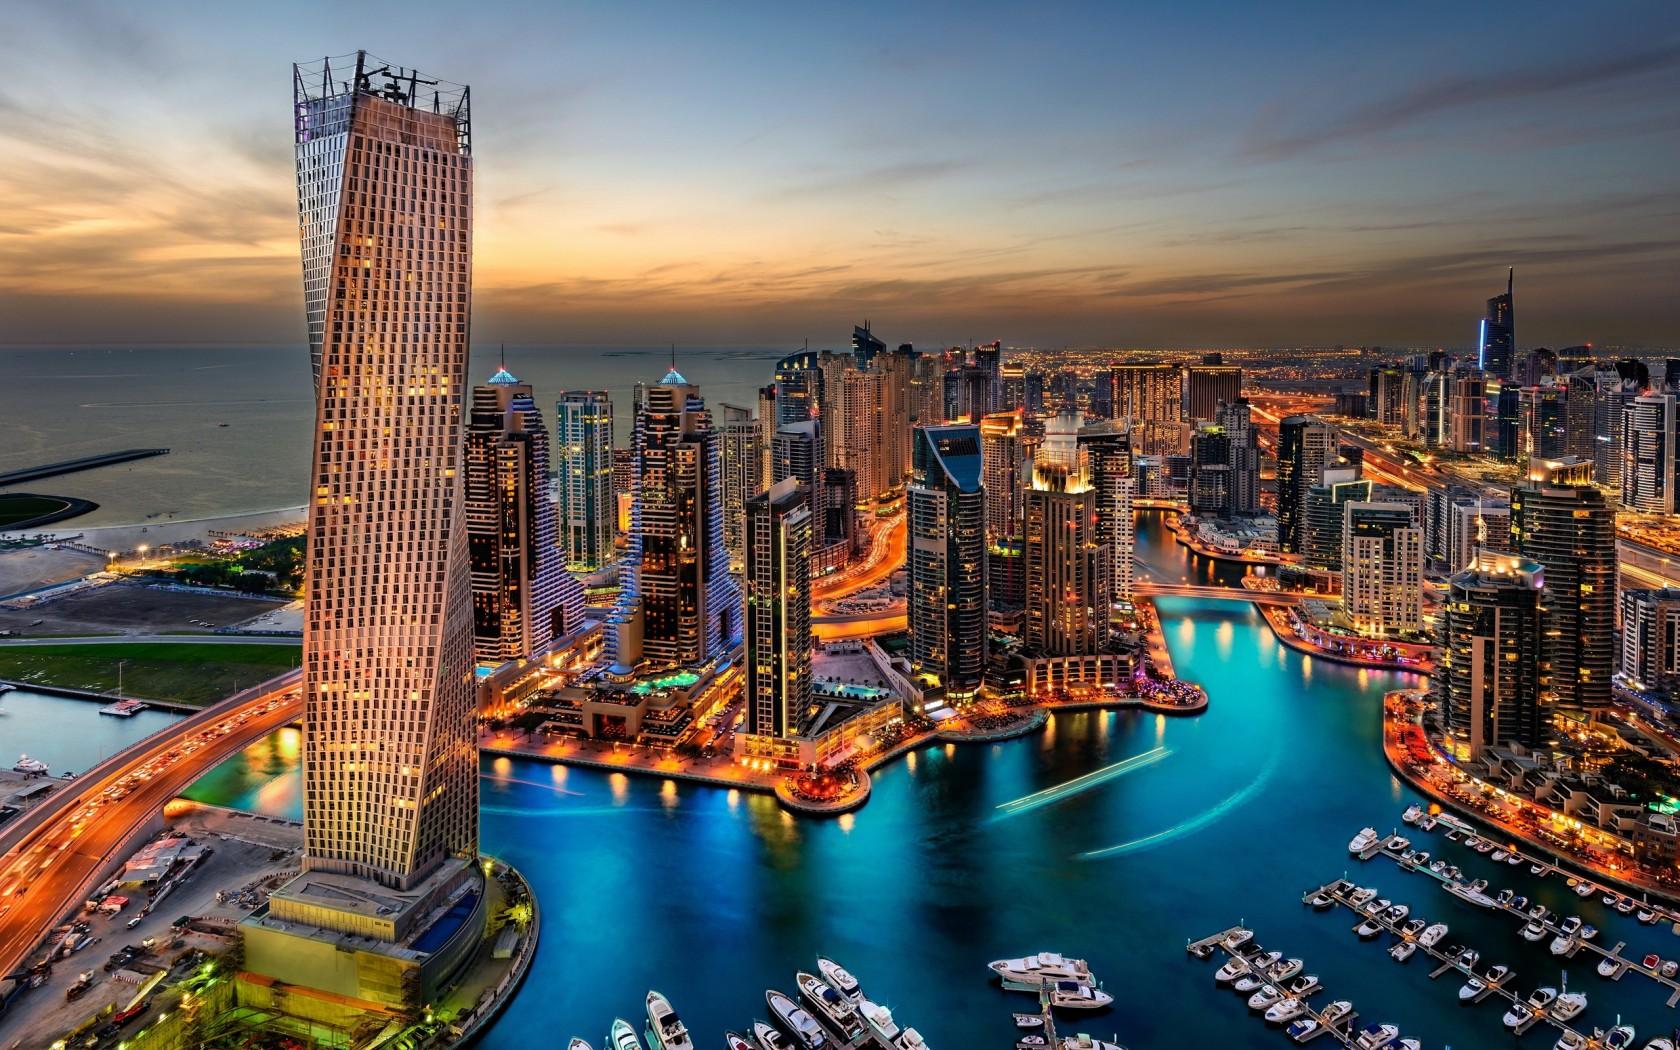 Panorama Towers Building In Panorama City